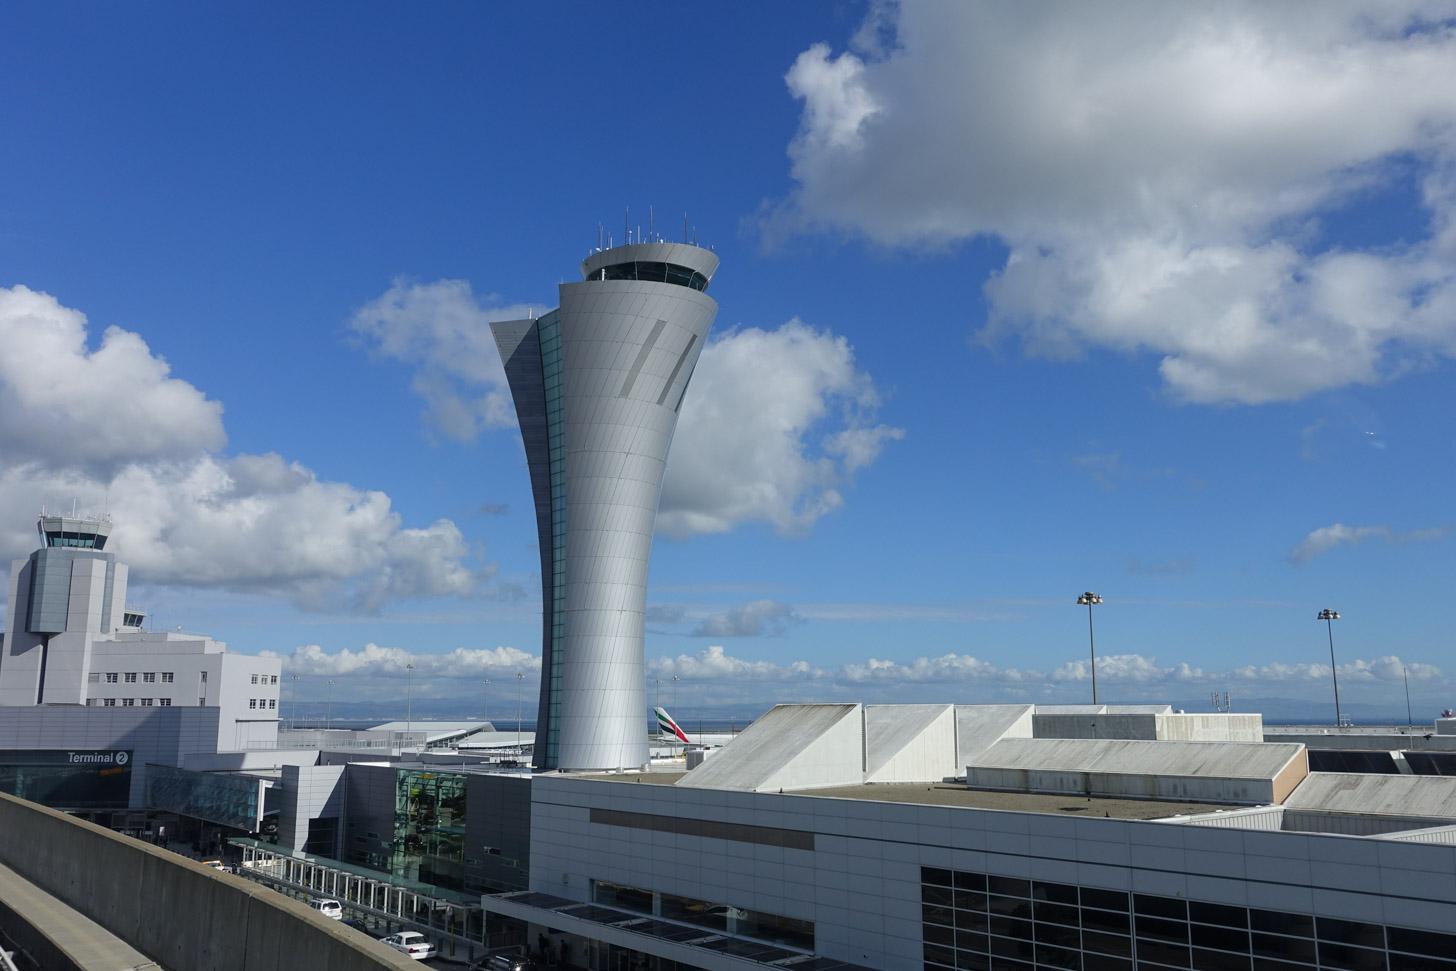 De luchthaven van San Francisco